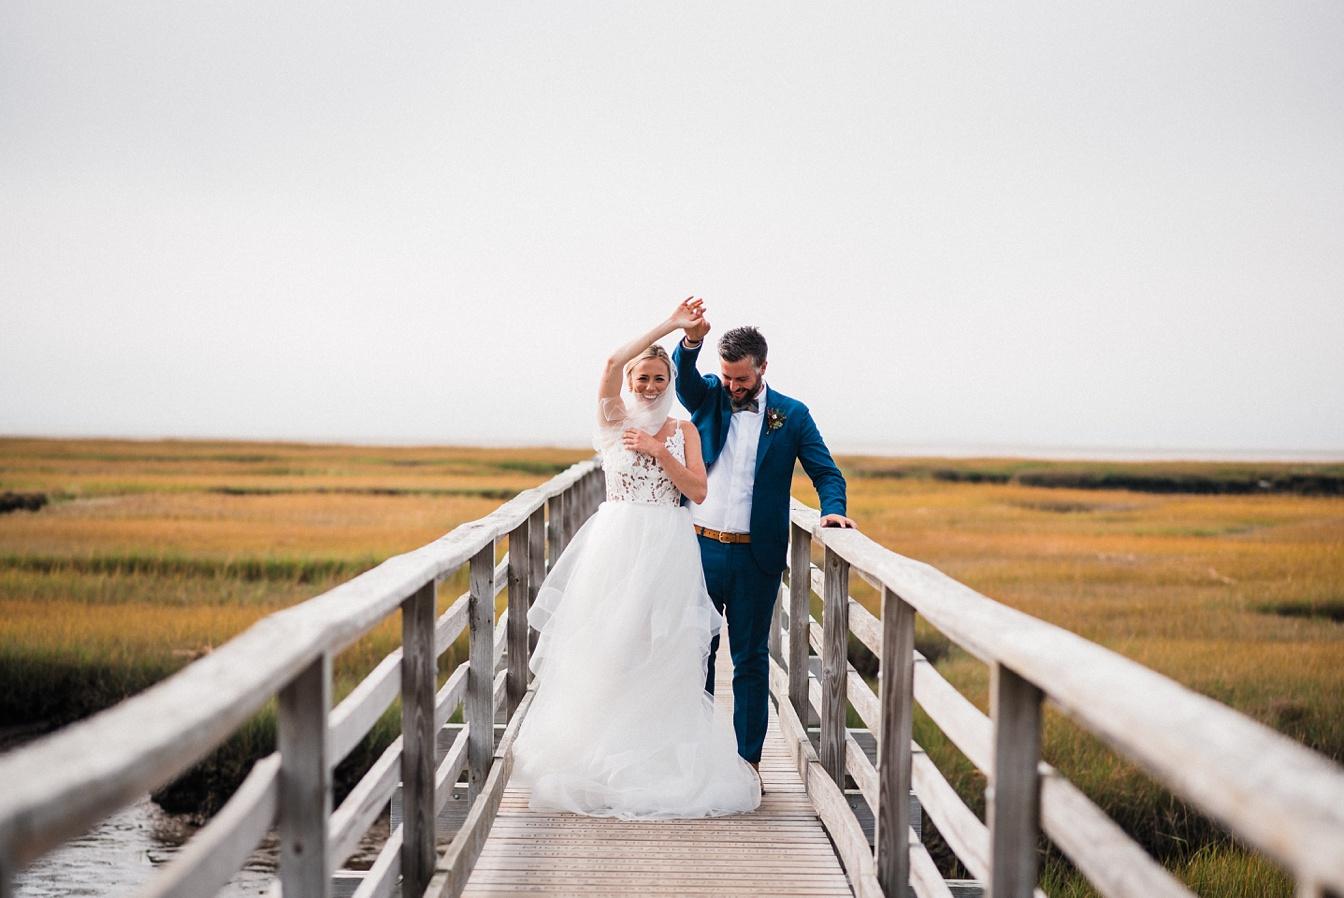 Eliza_Ben_Wedding_The_Foxes_Photography_157.jpg